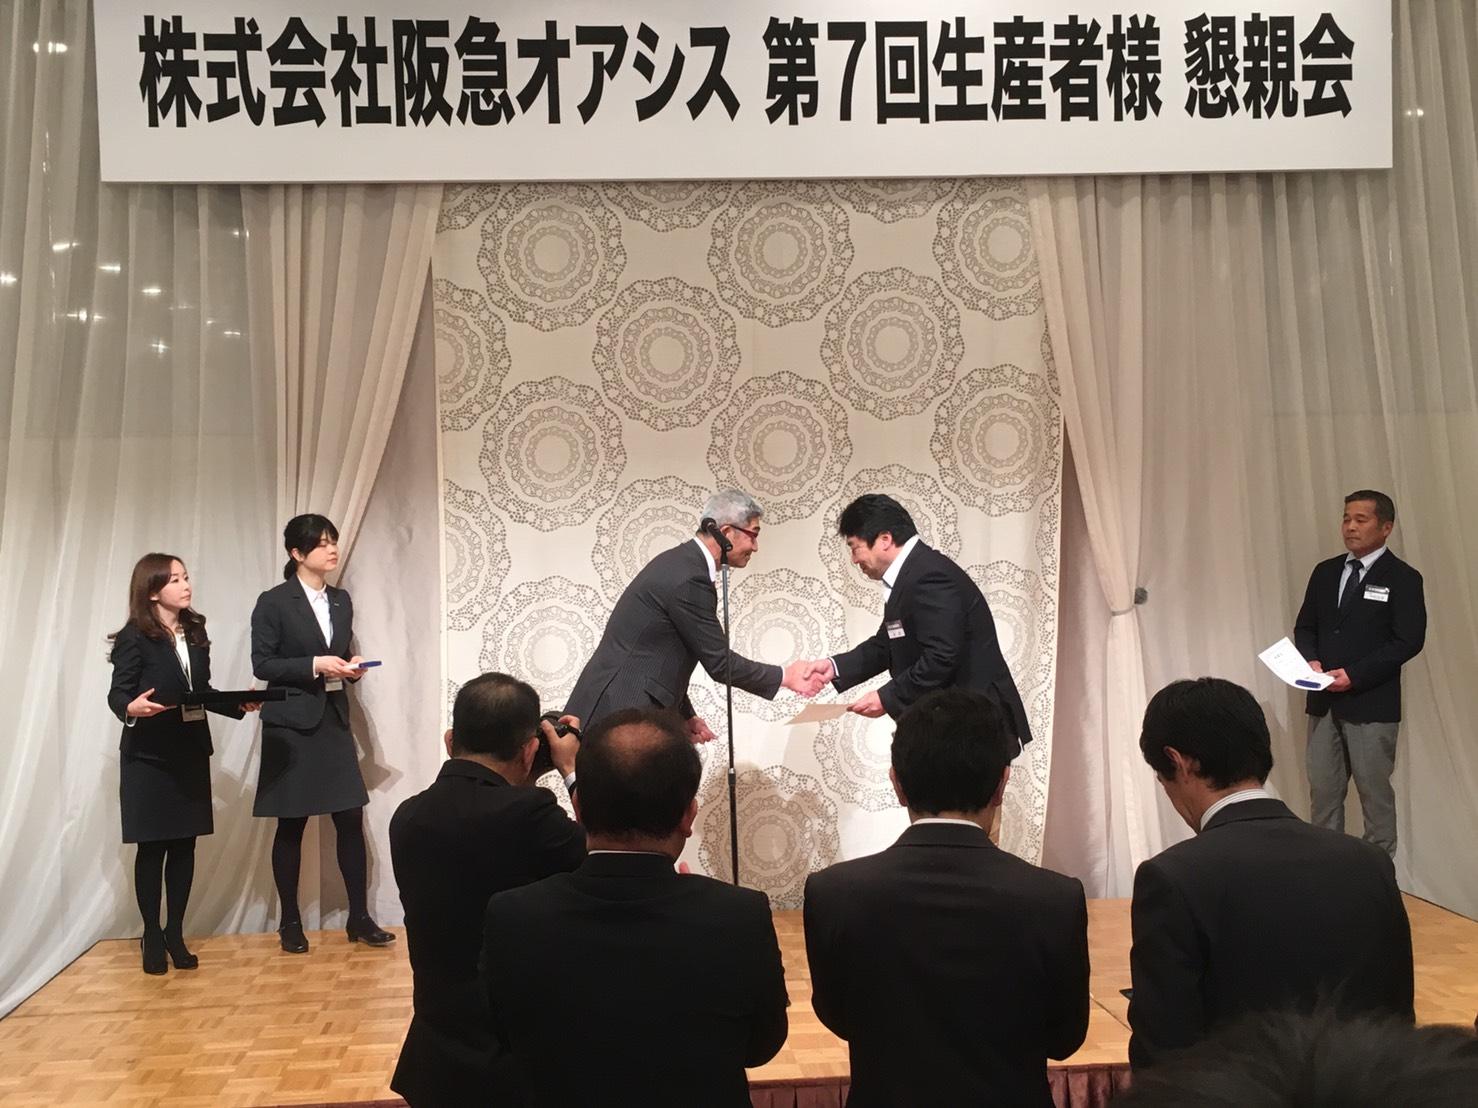 20161122 阪急オアシス生産者懇談会 (2)